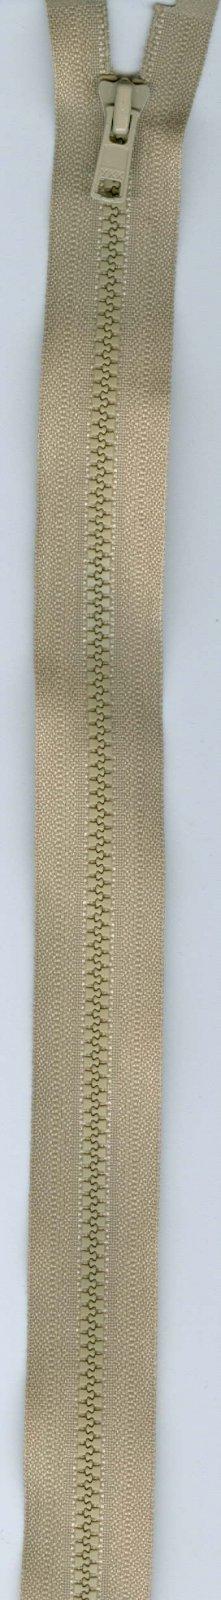 24 Separating Zipper #3 - Taupe